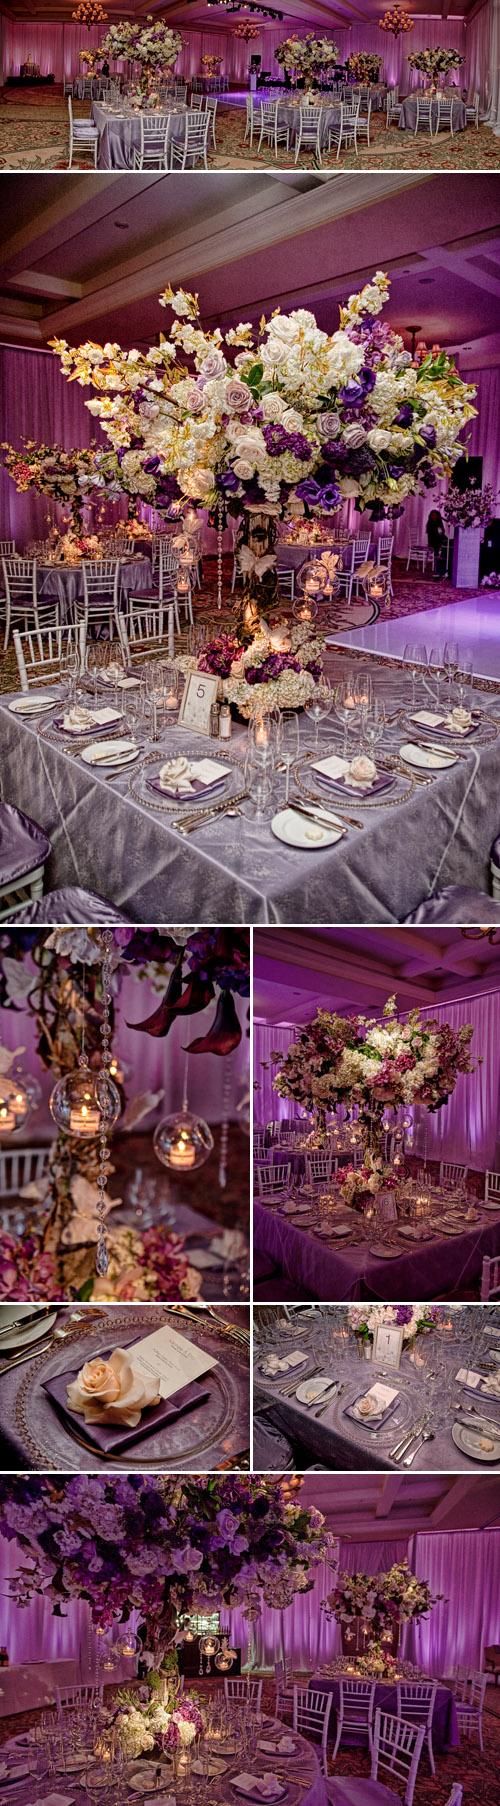 Purple wedding floral design by Nisie's Enchanted Florist, Montage Laguna Beach wedding, photos by Jason Lanier